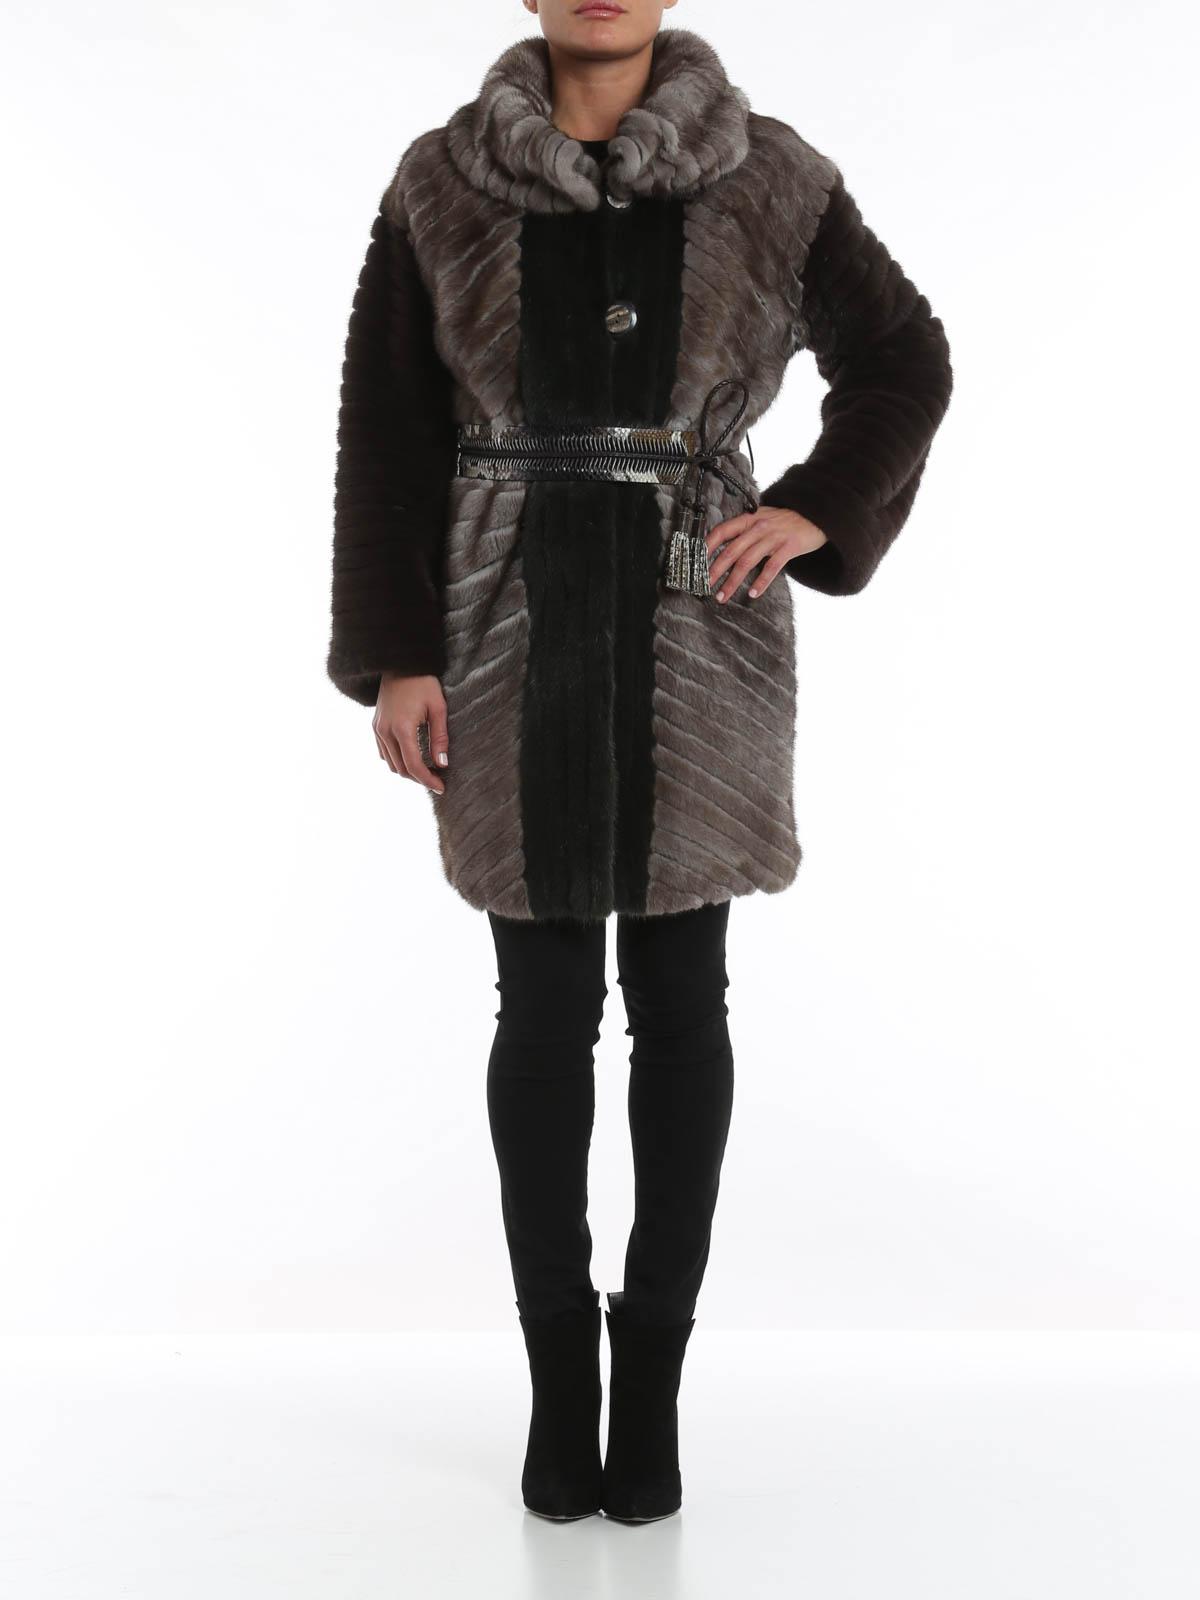 Mink fur and python belt coat by Rindi - Fur & Shearling Coats | iKRIX